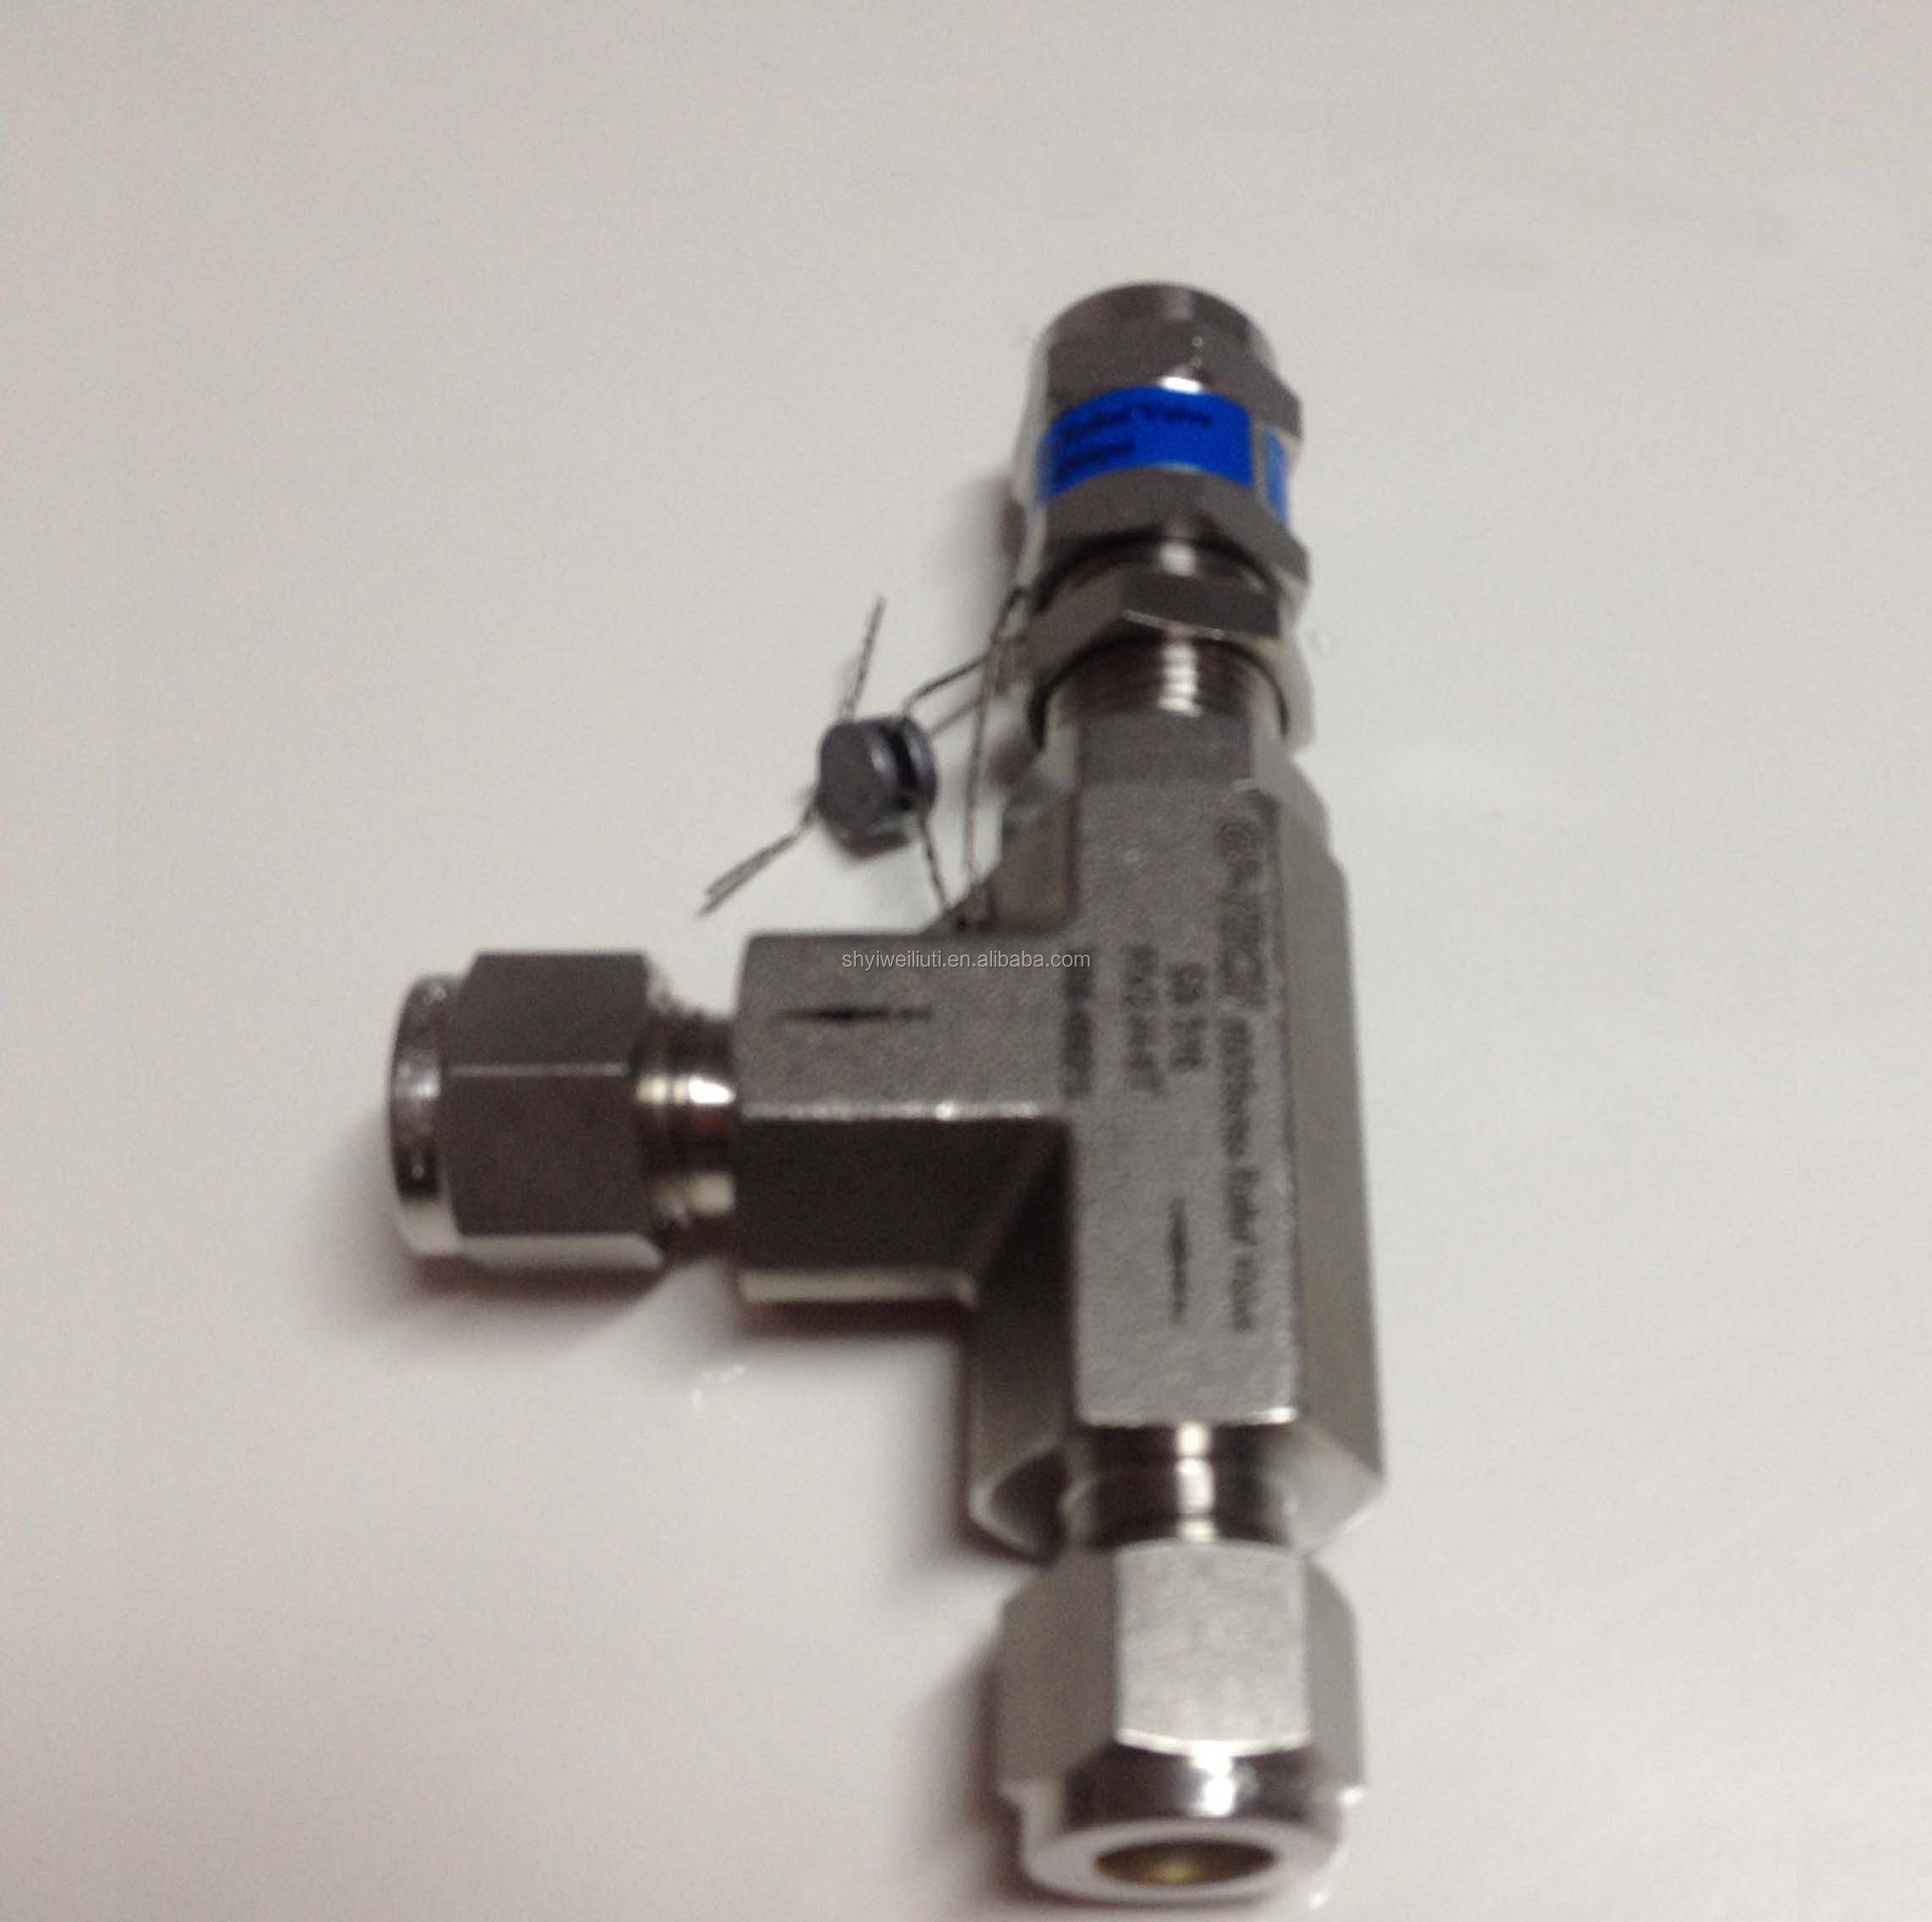 pressure relief valves 4 pressure relief valves hr® 750 series 750pu push open valve 750  series 750 one-way pressure and vacuum relief valves 770 series.